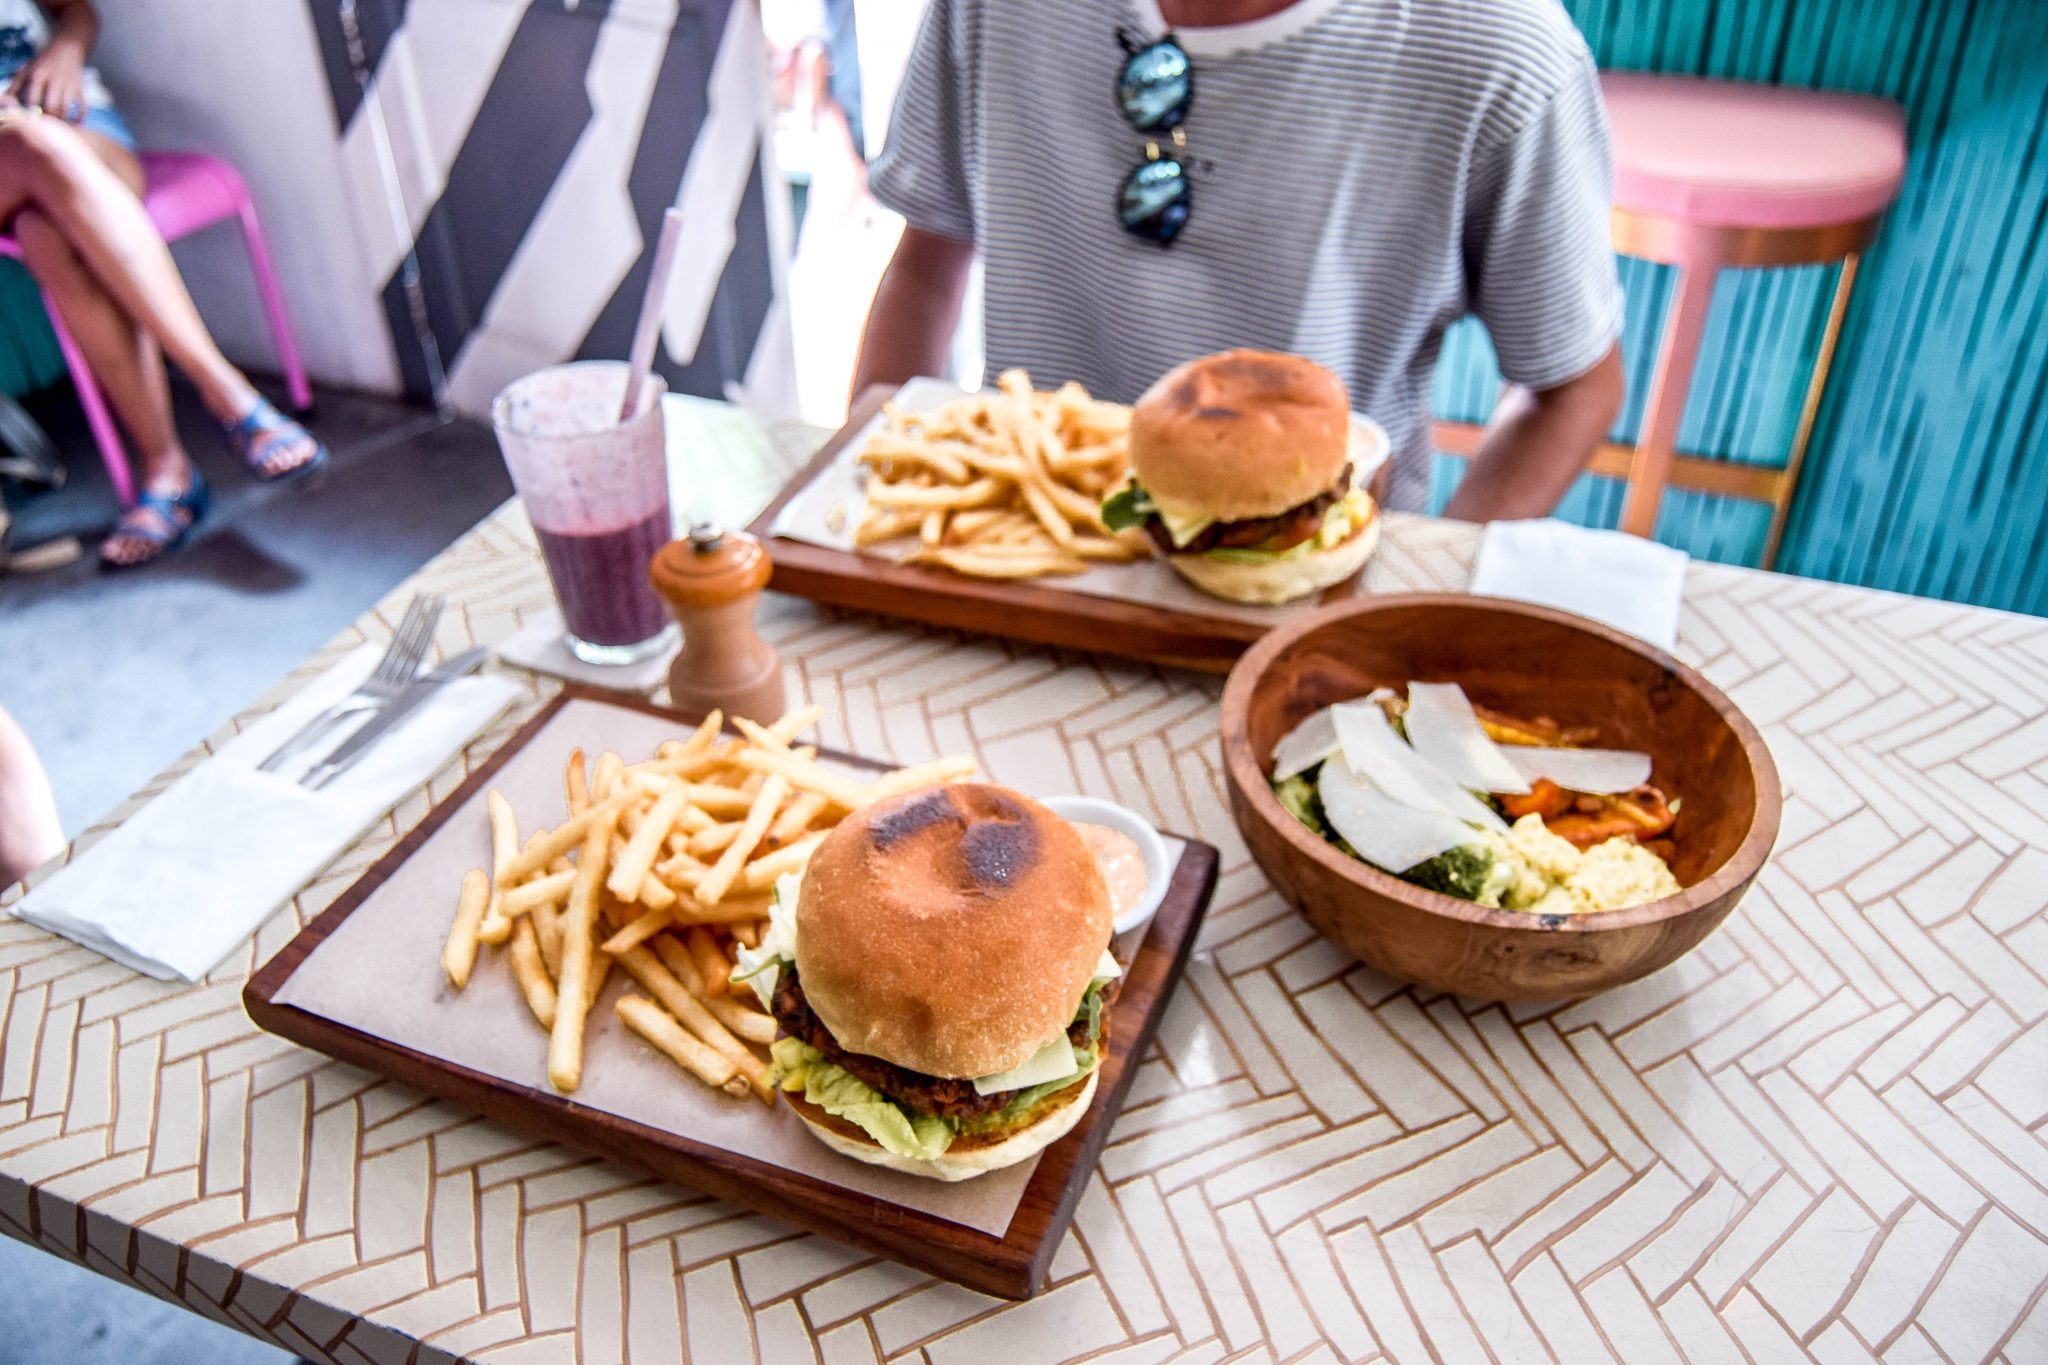 Wanderers & Warriors - Sea Circus Seminyak - Best Restaurants In Bali Restaurants - Best Restaurants In Seminyak